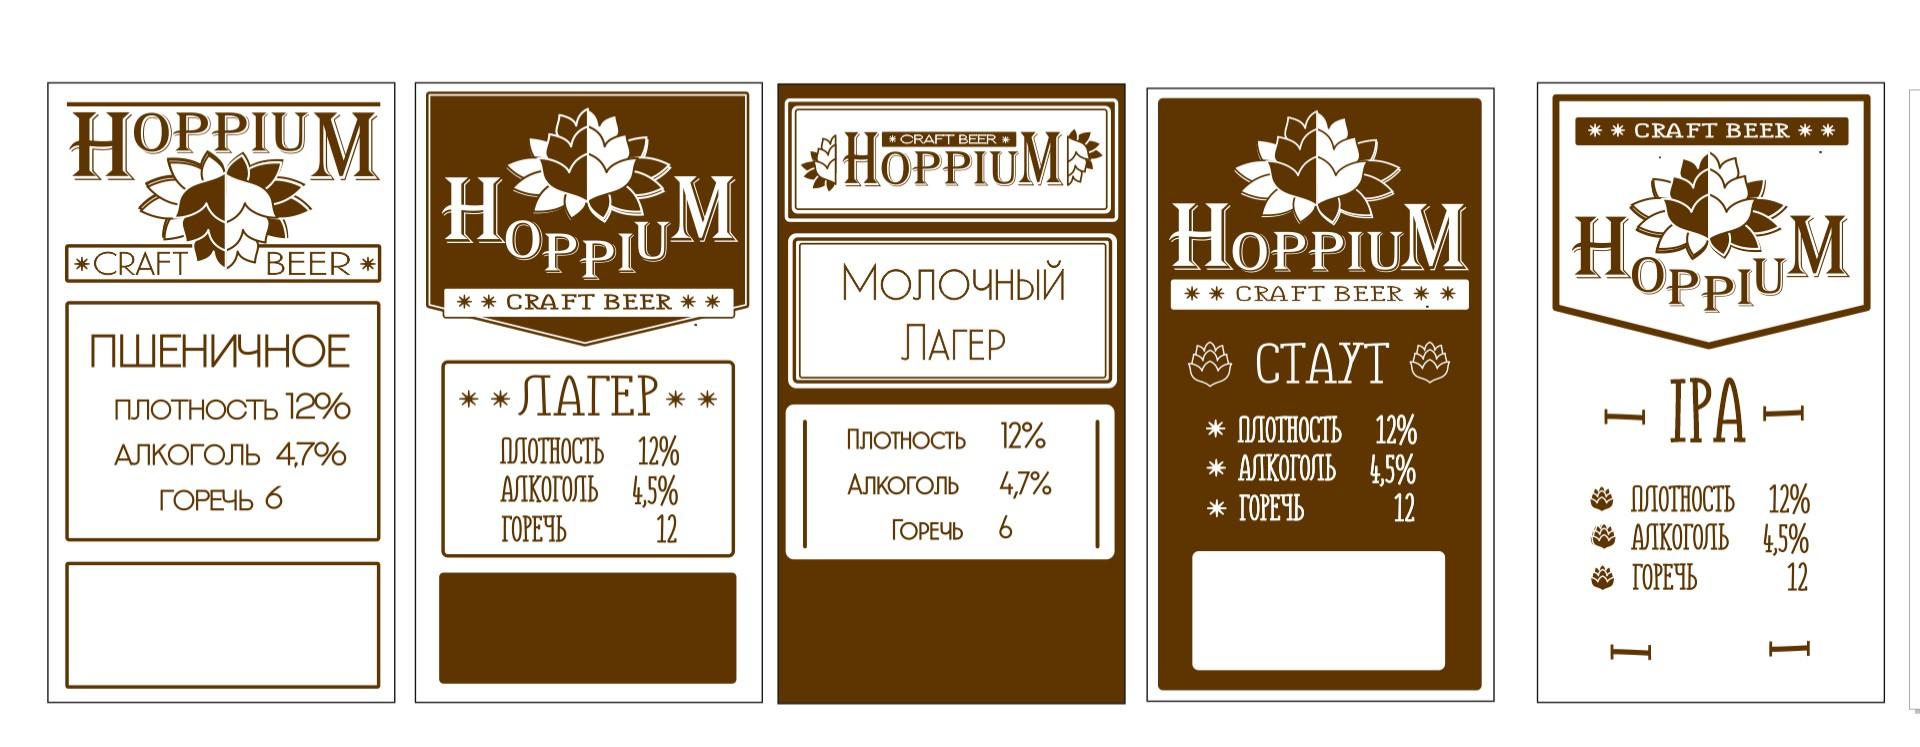 Логотип + Ценники для подмосковной крафтовой пивоварни фото f_8545dc046b618e83.jpg